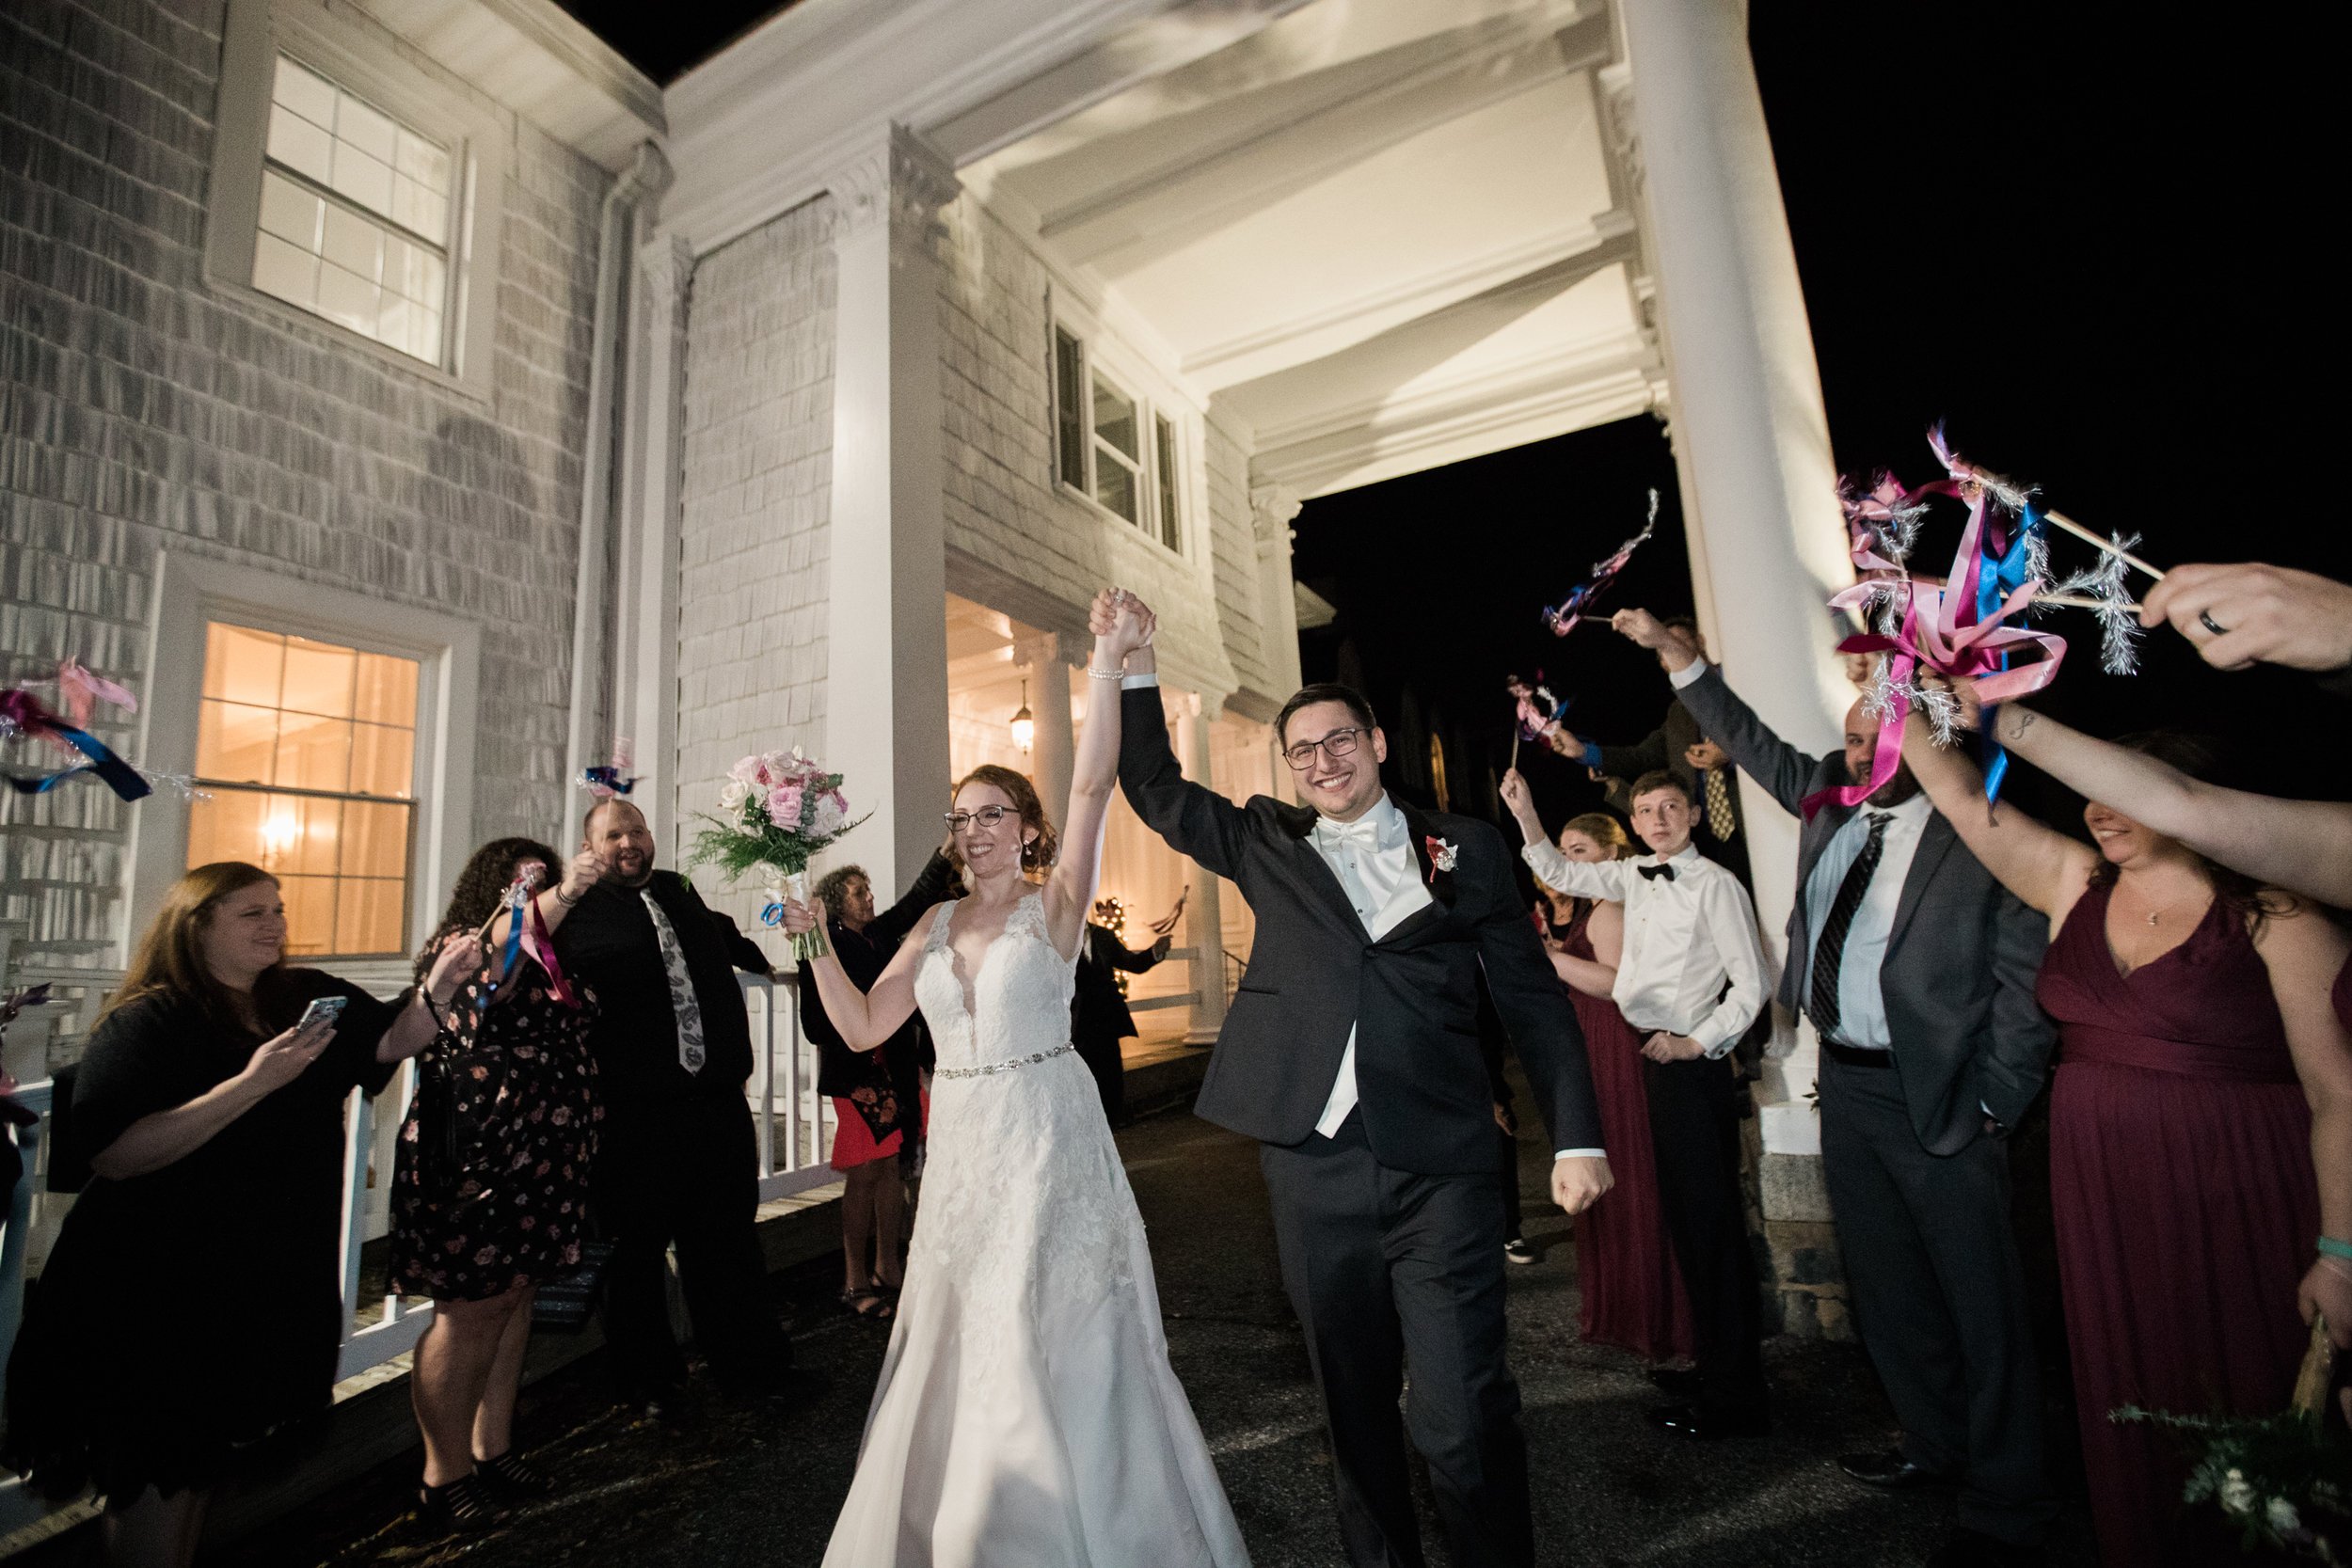 Harry Potter Wedding at Overhills Mansion Catonville Maryland Wedding Photographers Megapixels Media (133 of 134).jpg